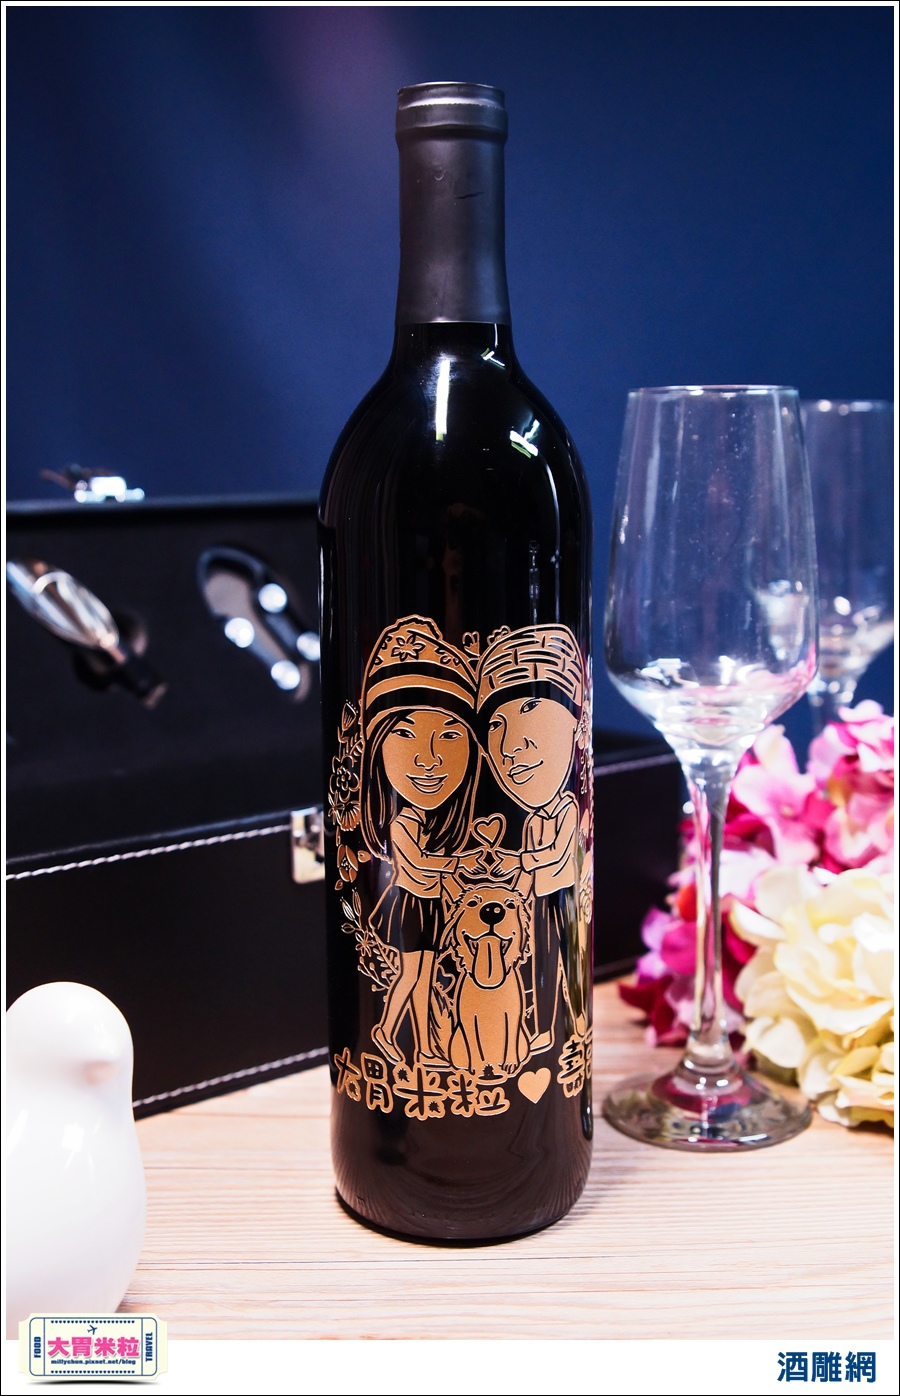 9DKing酒雕網-酒瓶雕刻推薦-millychun0007.jpg